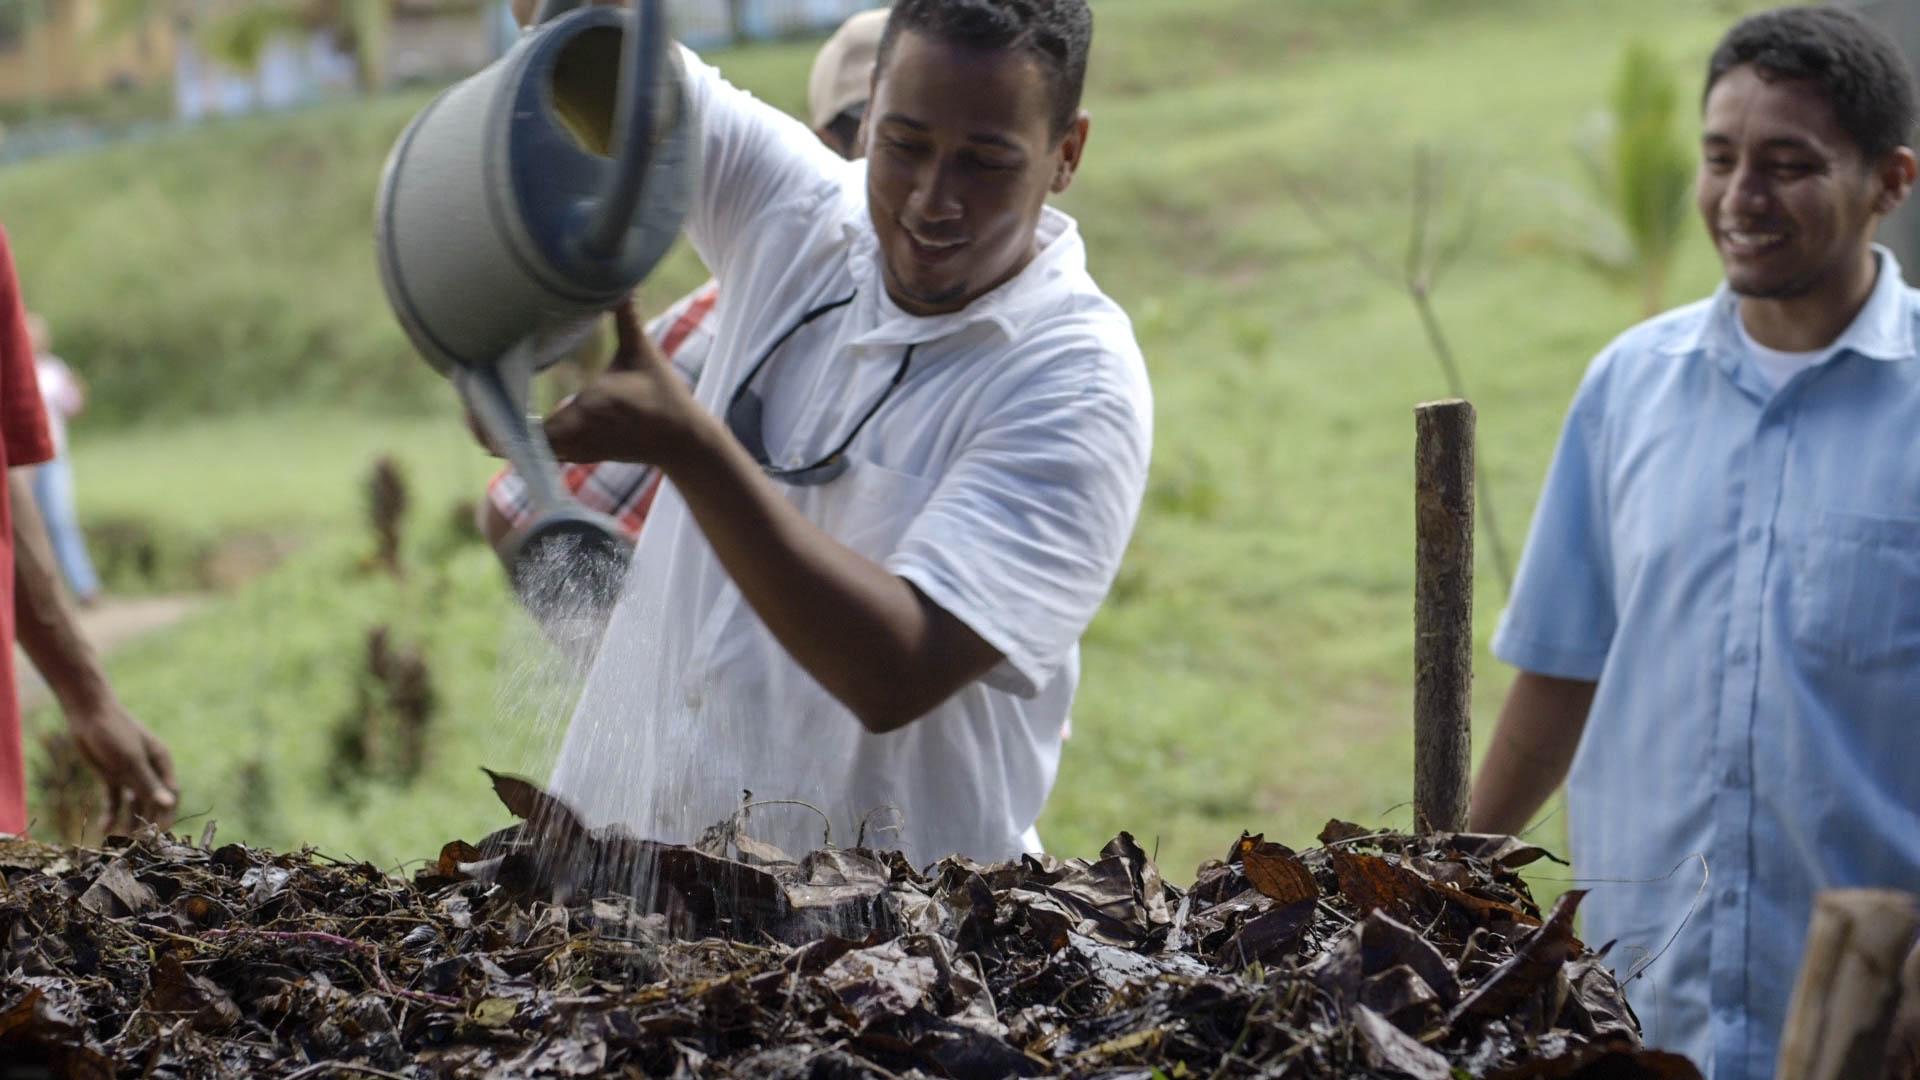 Watering compost, Biointensive training - video still, Tom